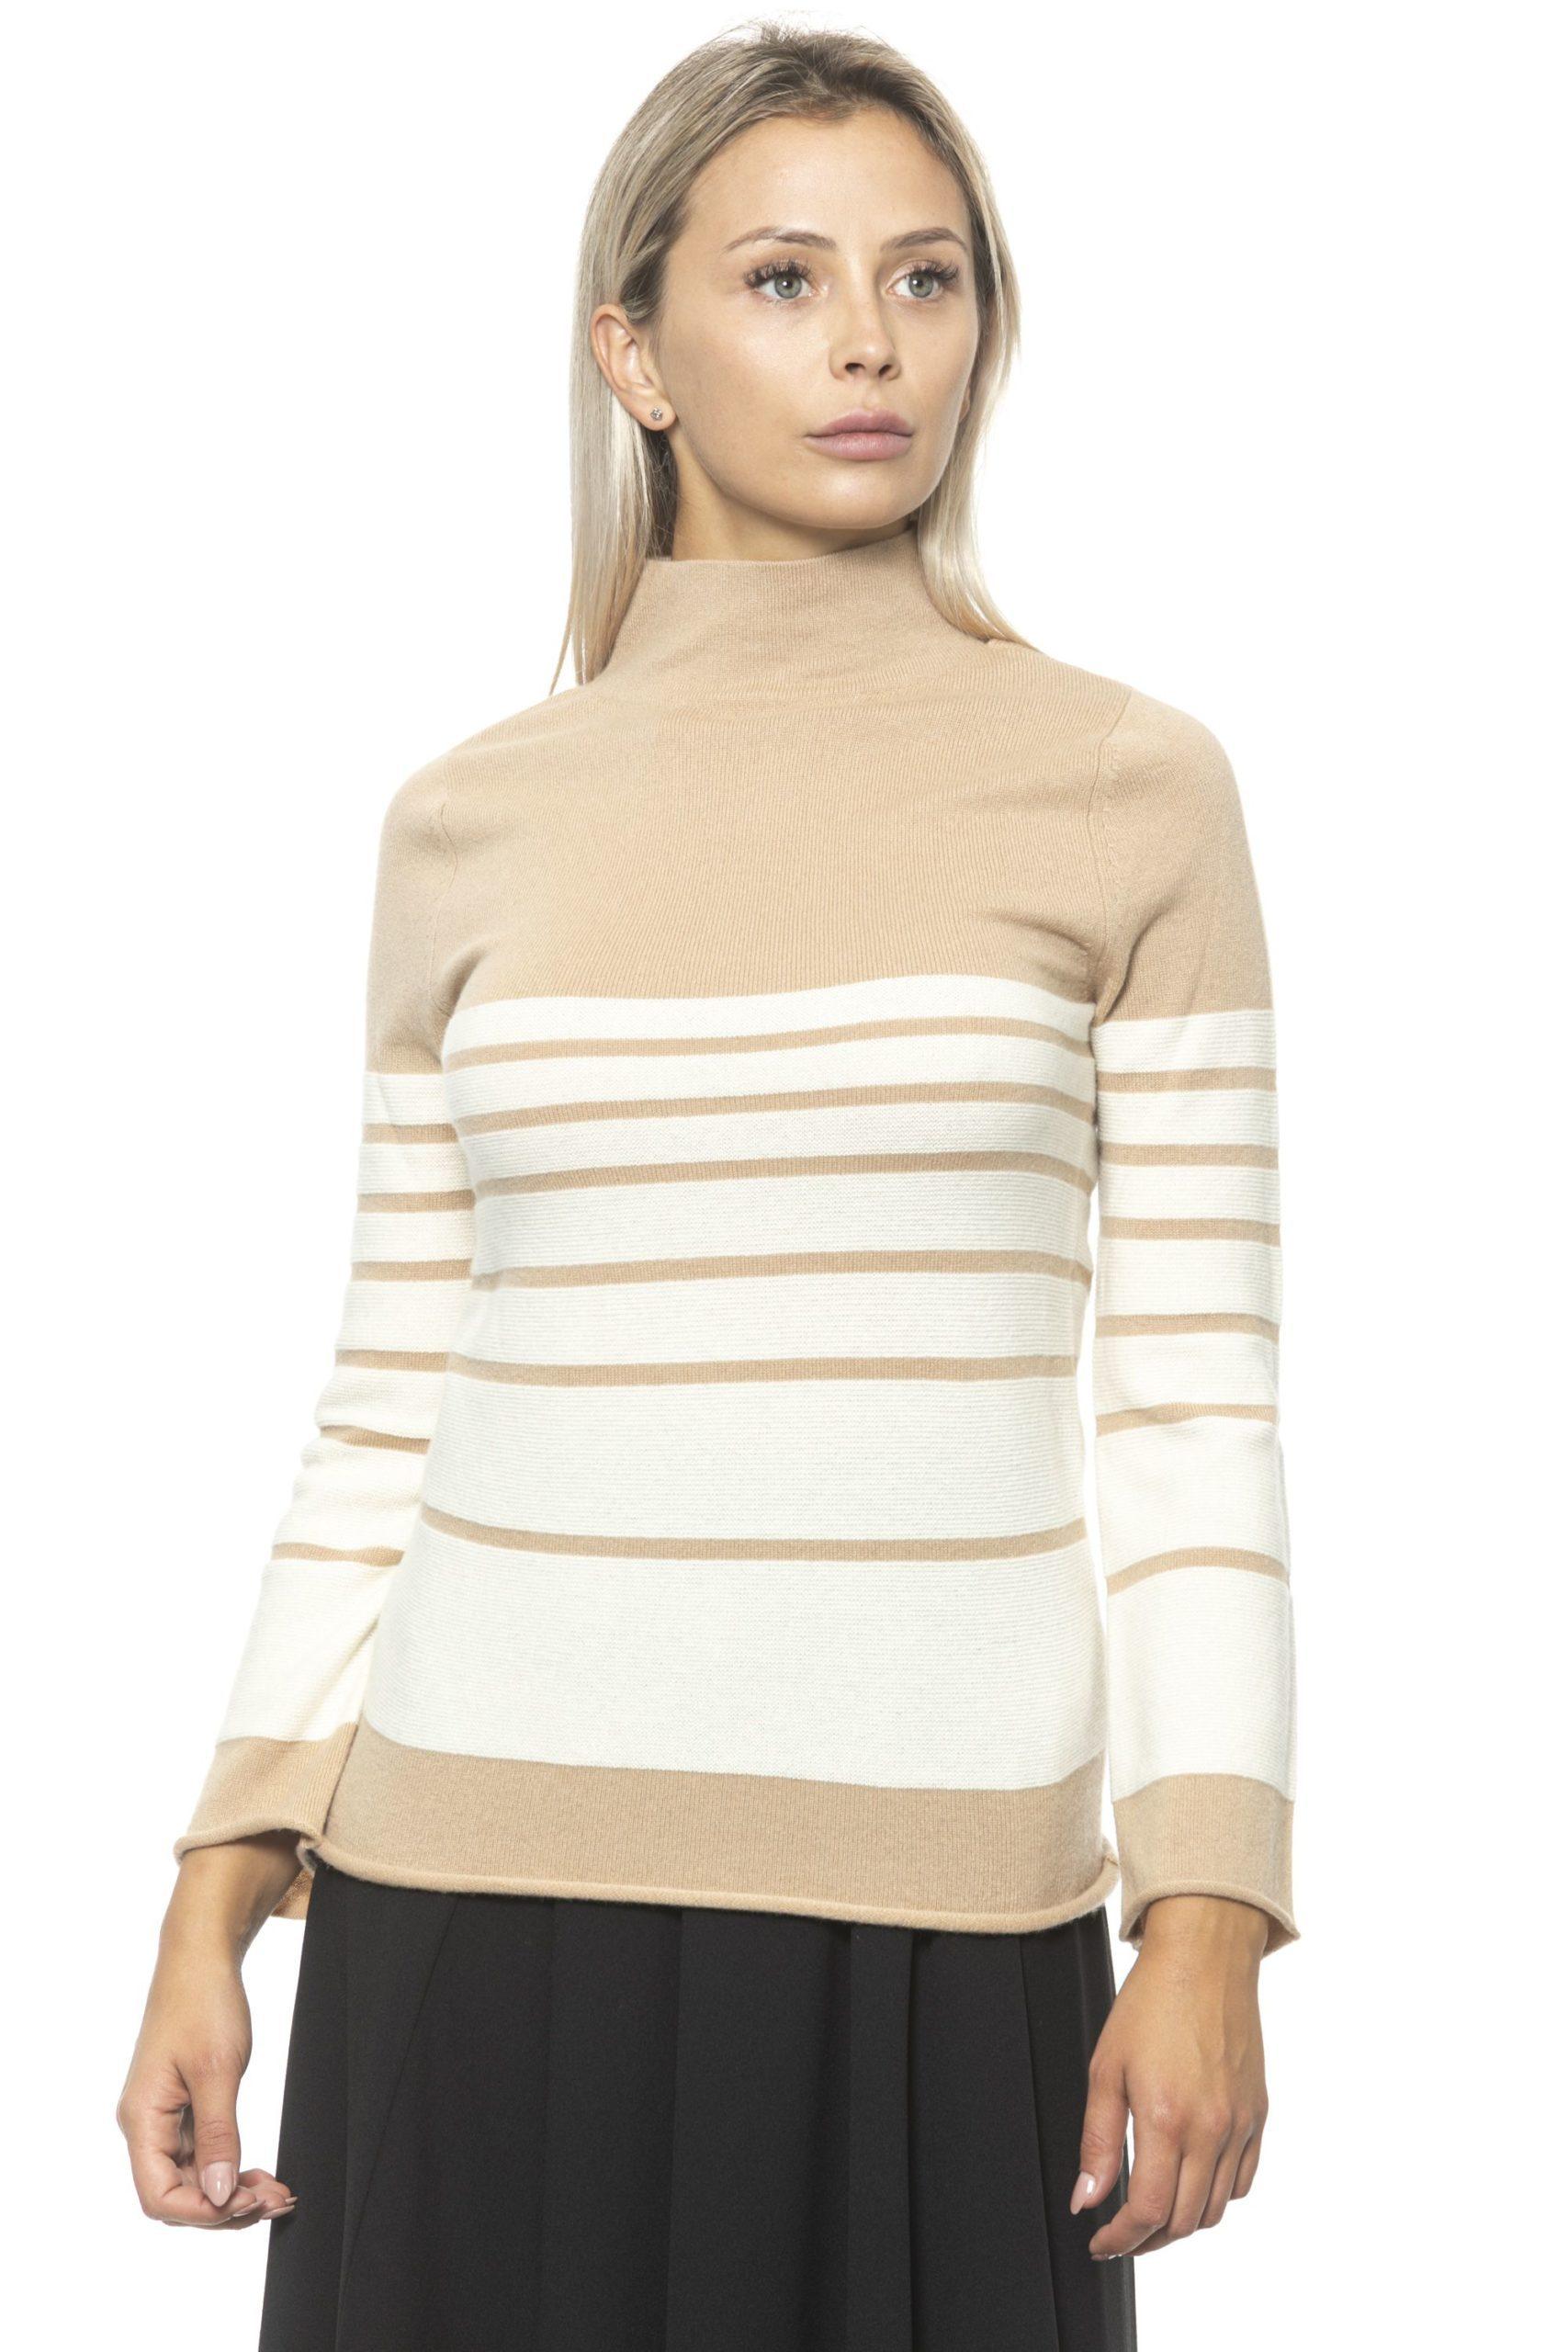 Alpha Studio Women's V A R. U N I C A Sweater Beige AL1313067 - IT40 | XS